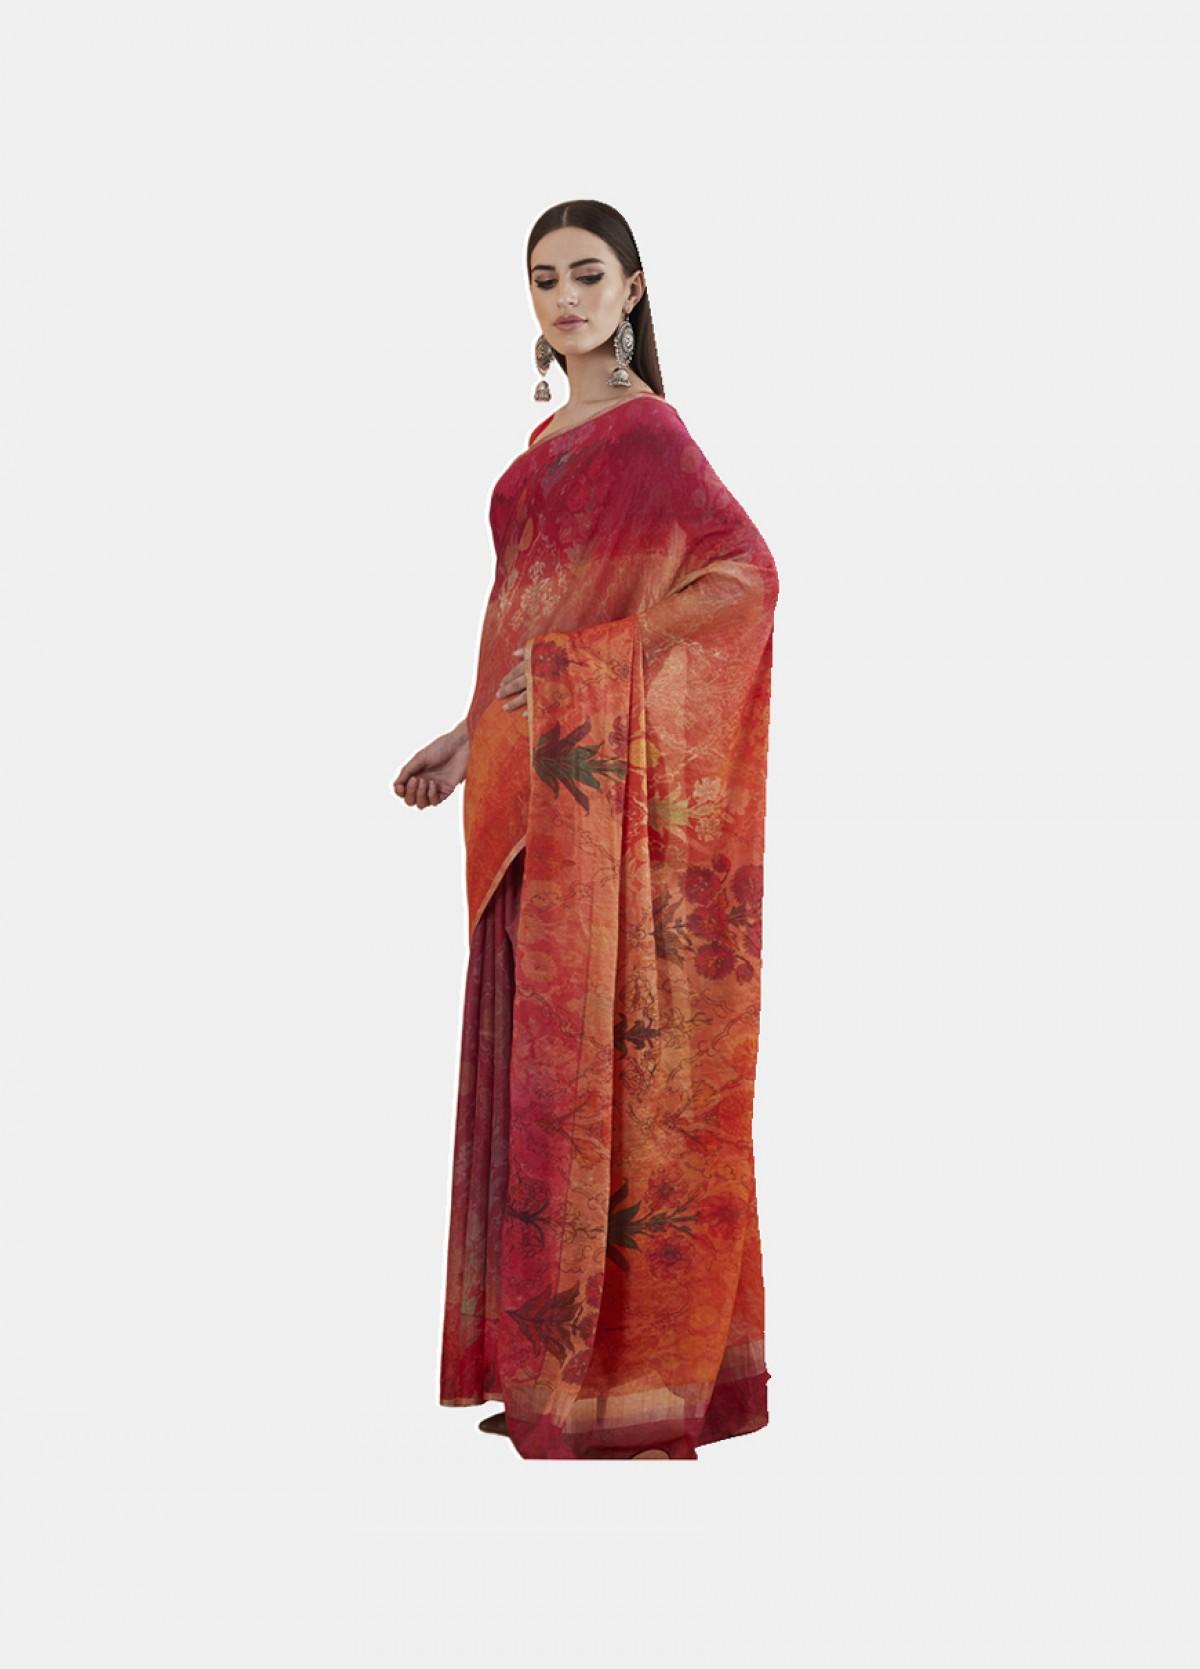 The Silk Satin Pink Printed Sari